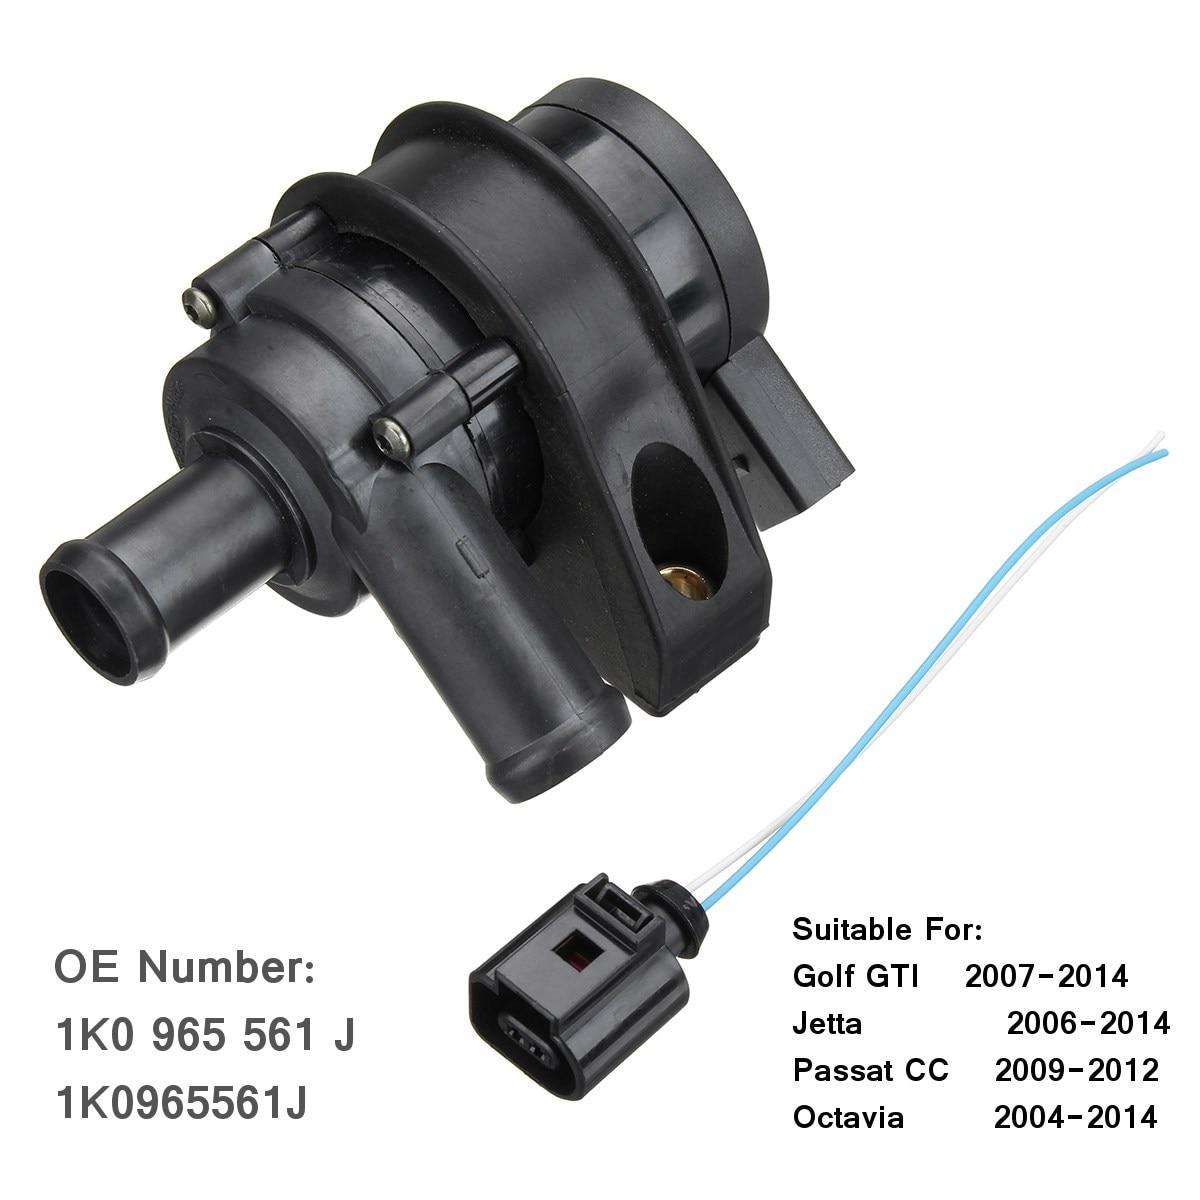 Engine Circulating Cooling Water Pump Auxiliary For VW Jetta Golf GTI Passat CC 1K0 965 561 J 1K0965561J